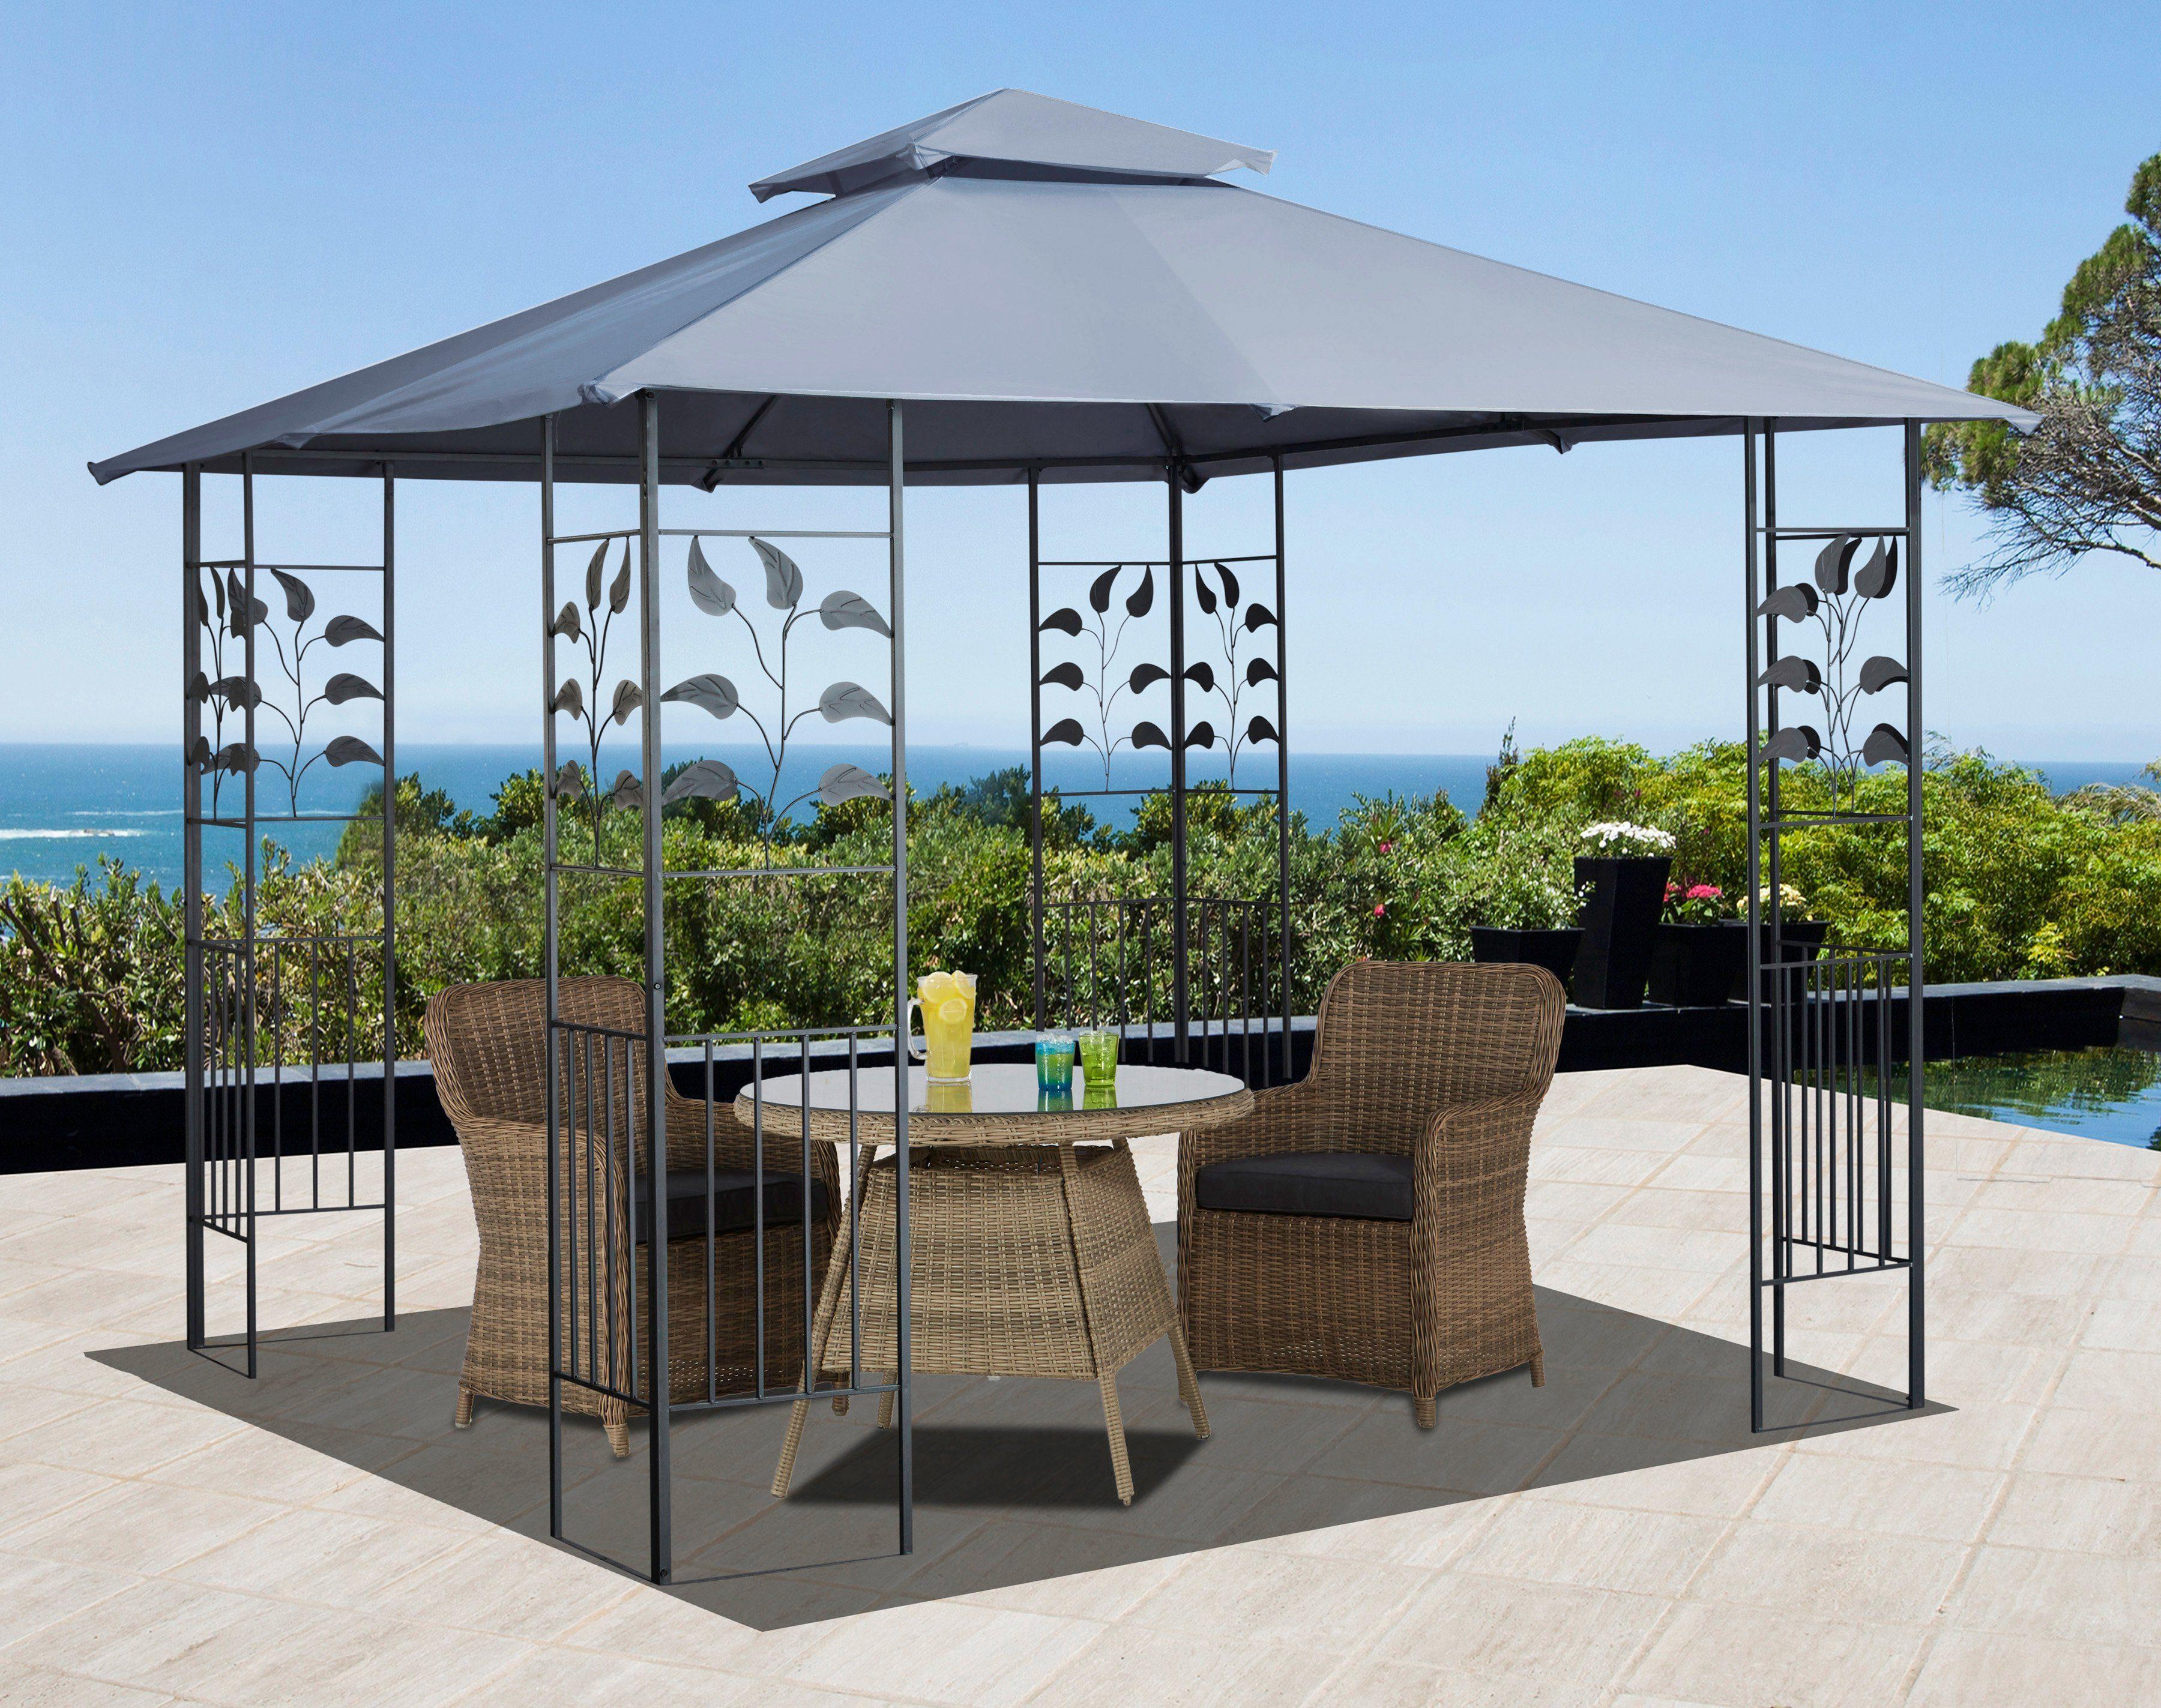 pavillon 8 eckig gm88 hitoiro. Black Bedroom Furniture Sets. Home Design Ideas